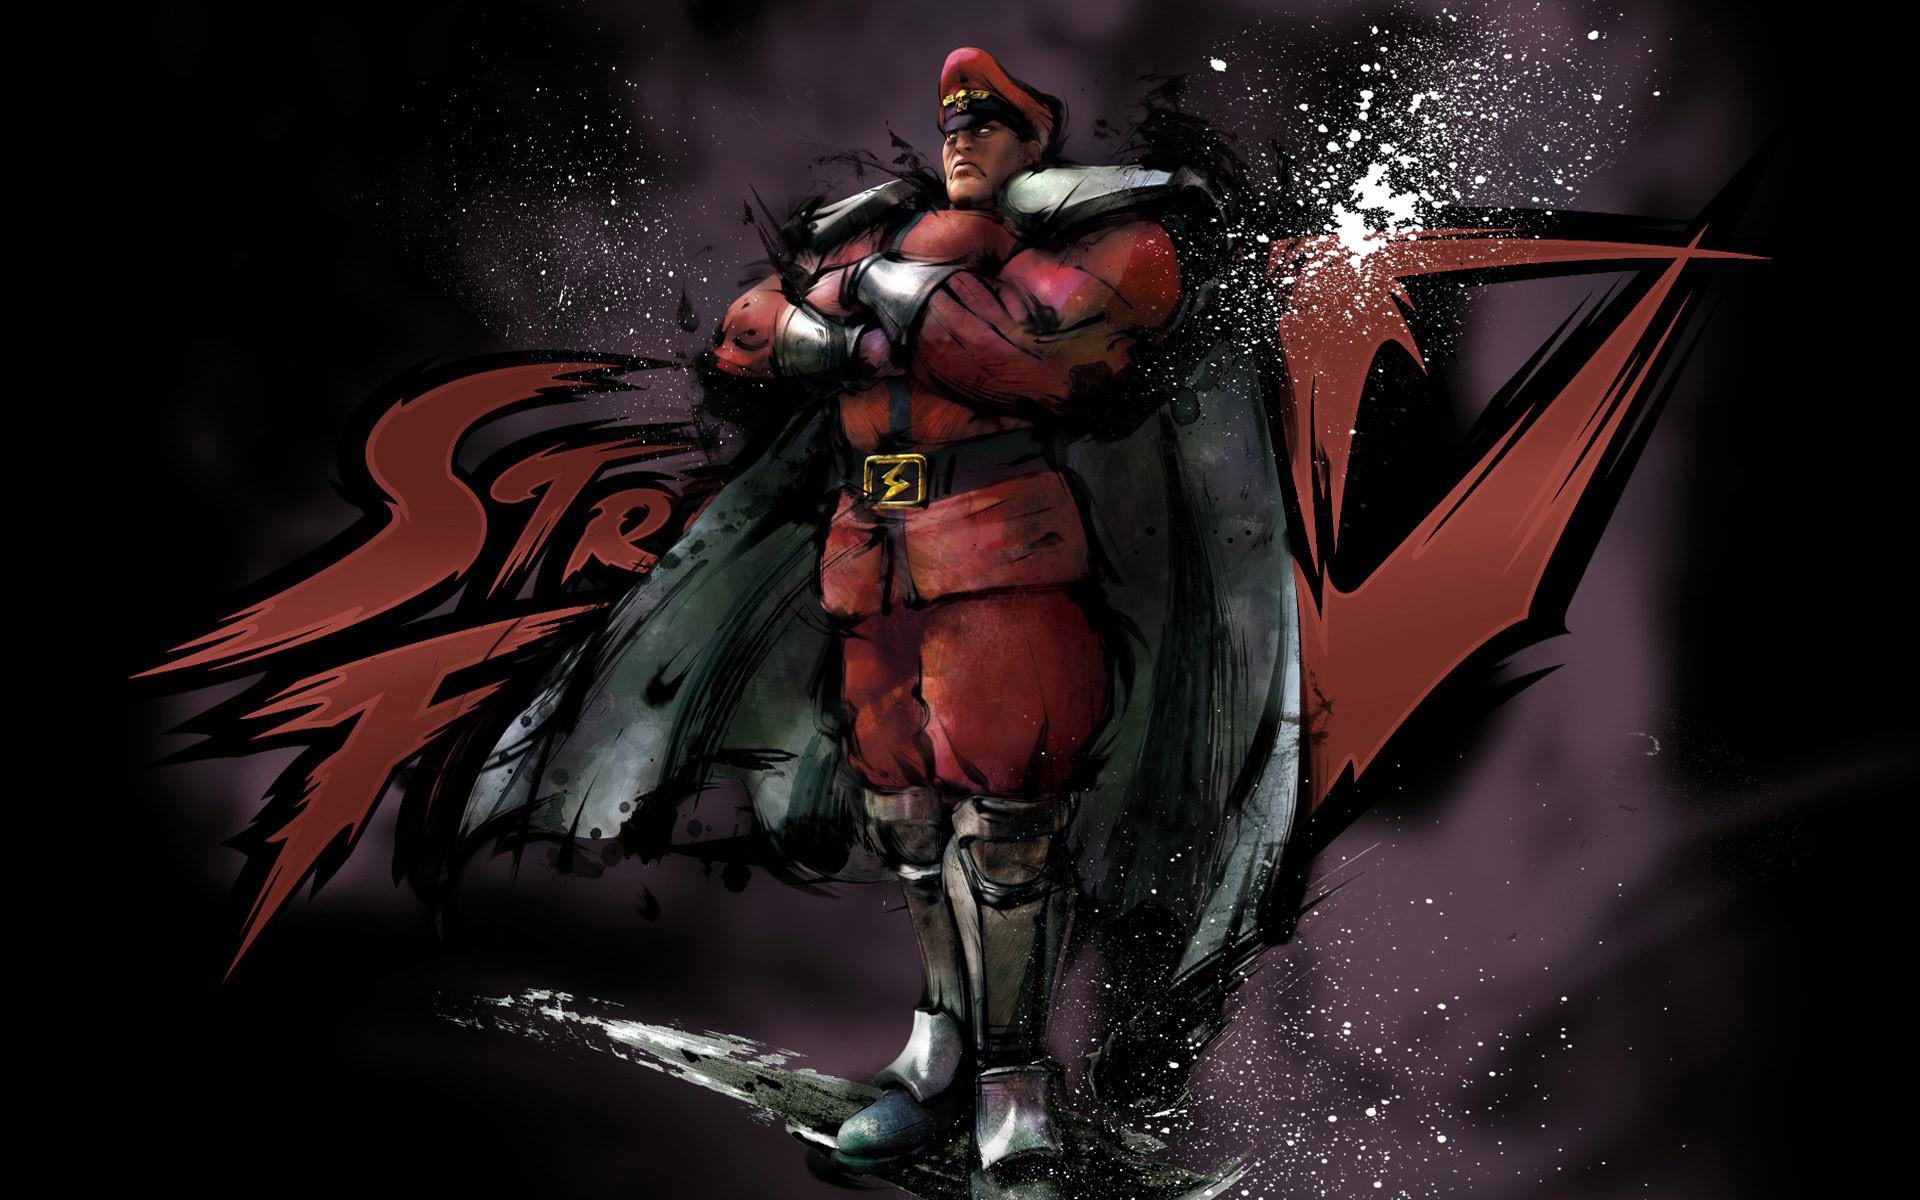 Jin Kazama Wallpaper Tekken 6 1